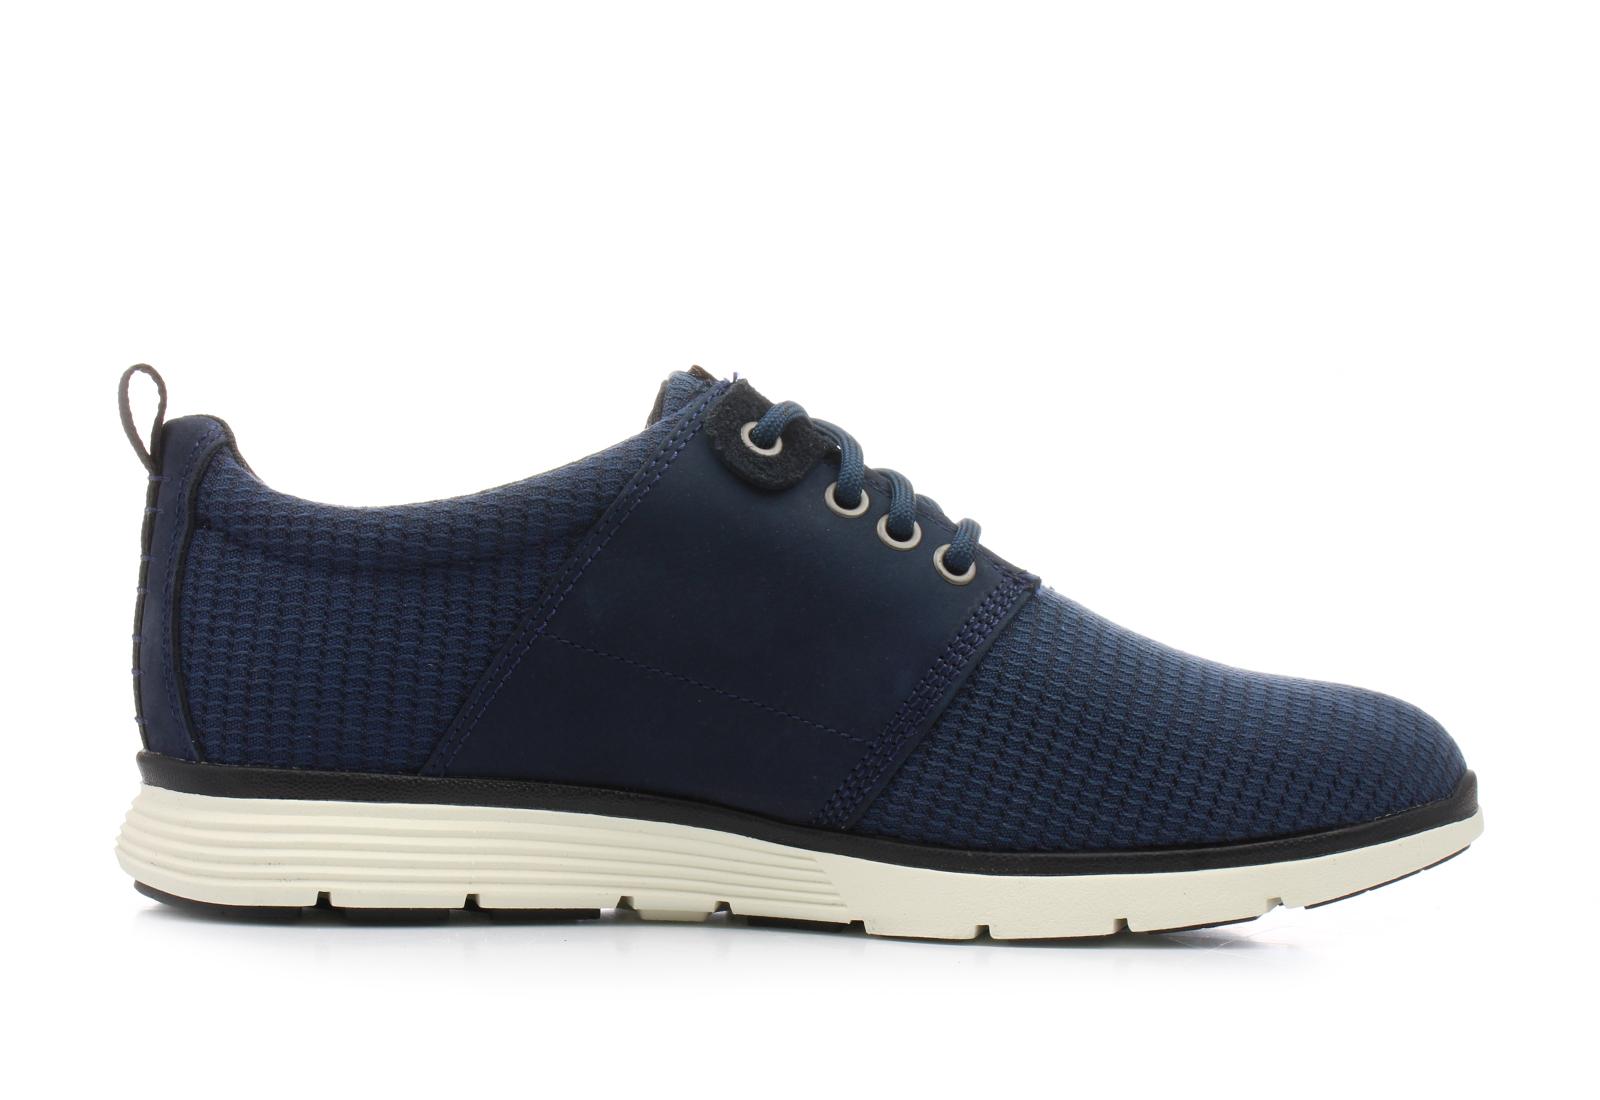 Timberland Shoes Killington Ox A1j51 Nvy Online Shop